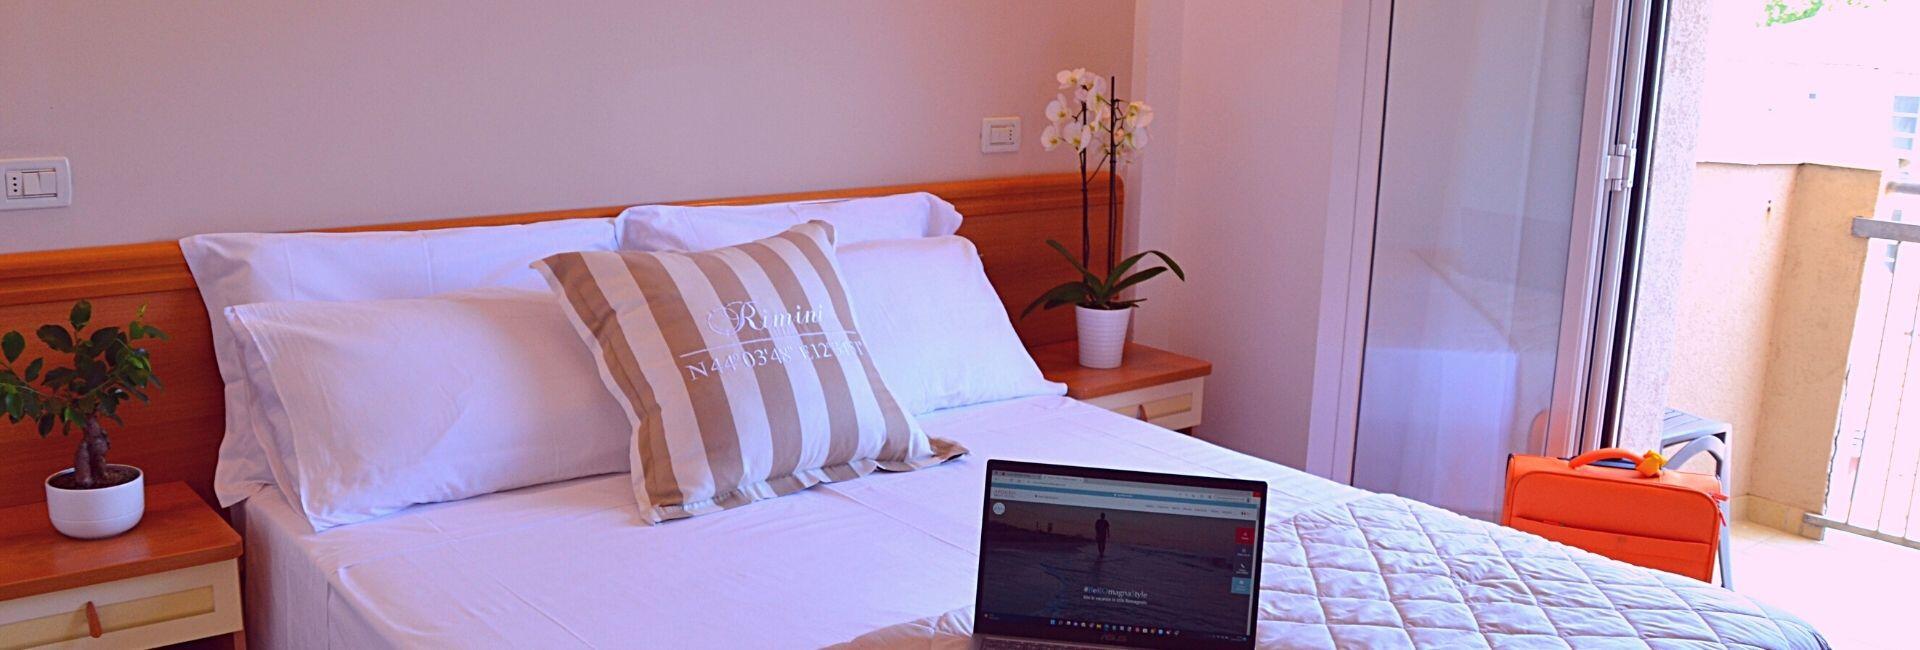 hotelapogeo it camere 006